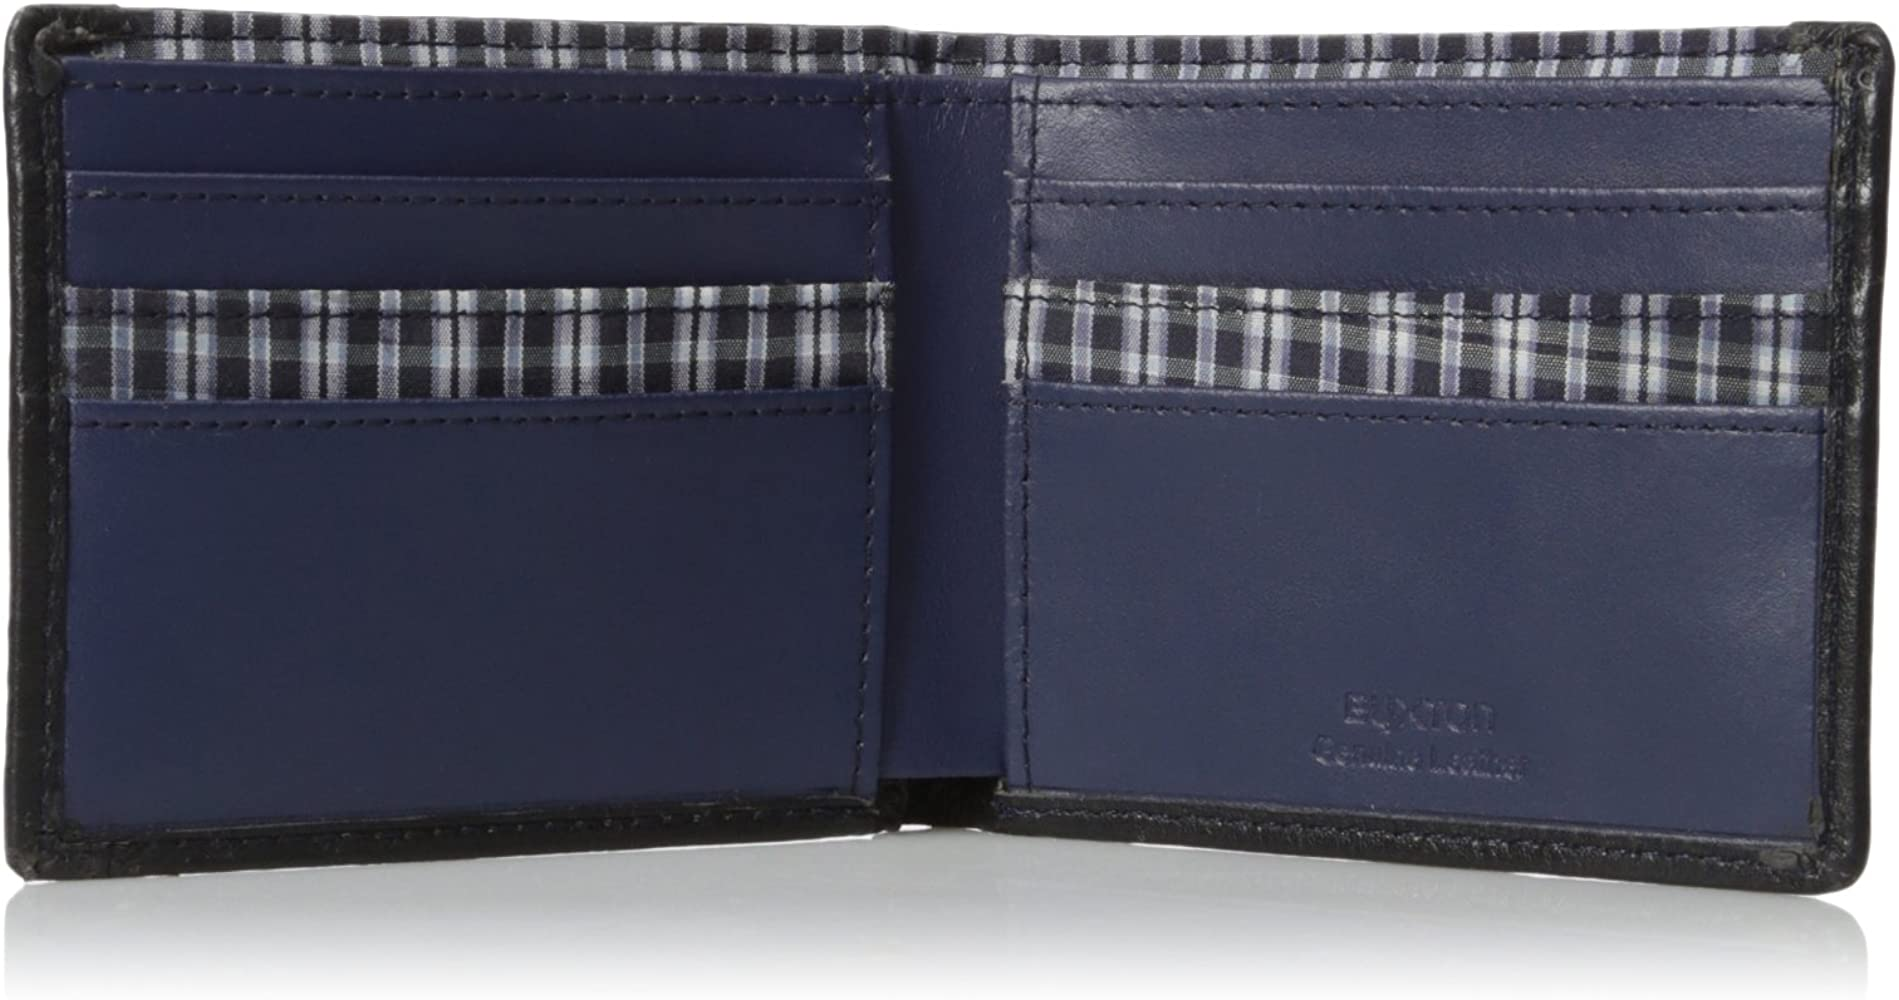 Black One Size Buxton Men/'s Tulsa RFID Blocking Slimfold Slim Wallet